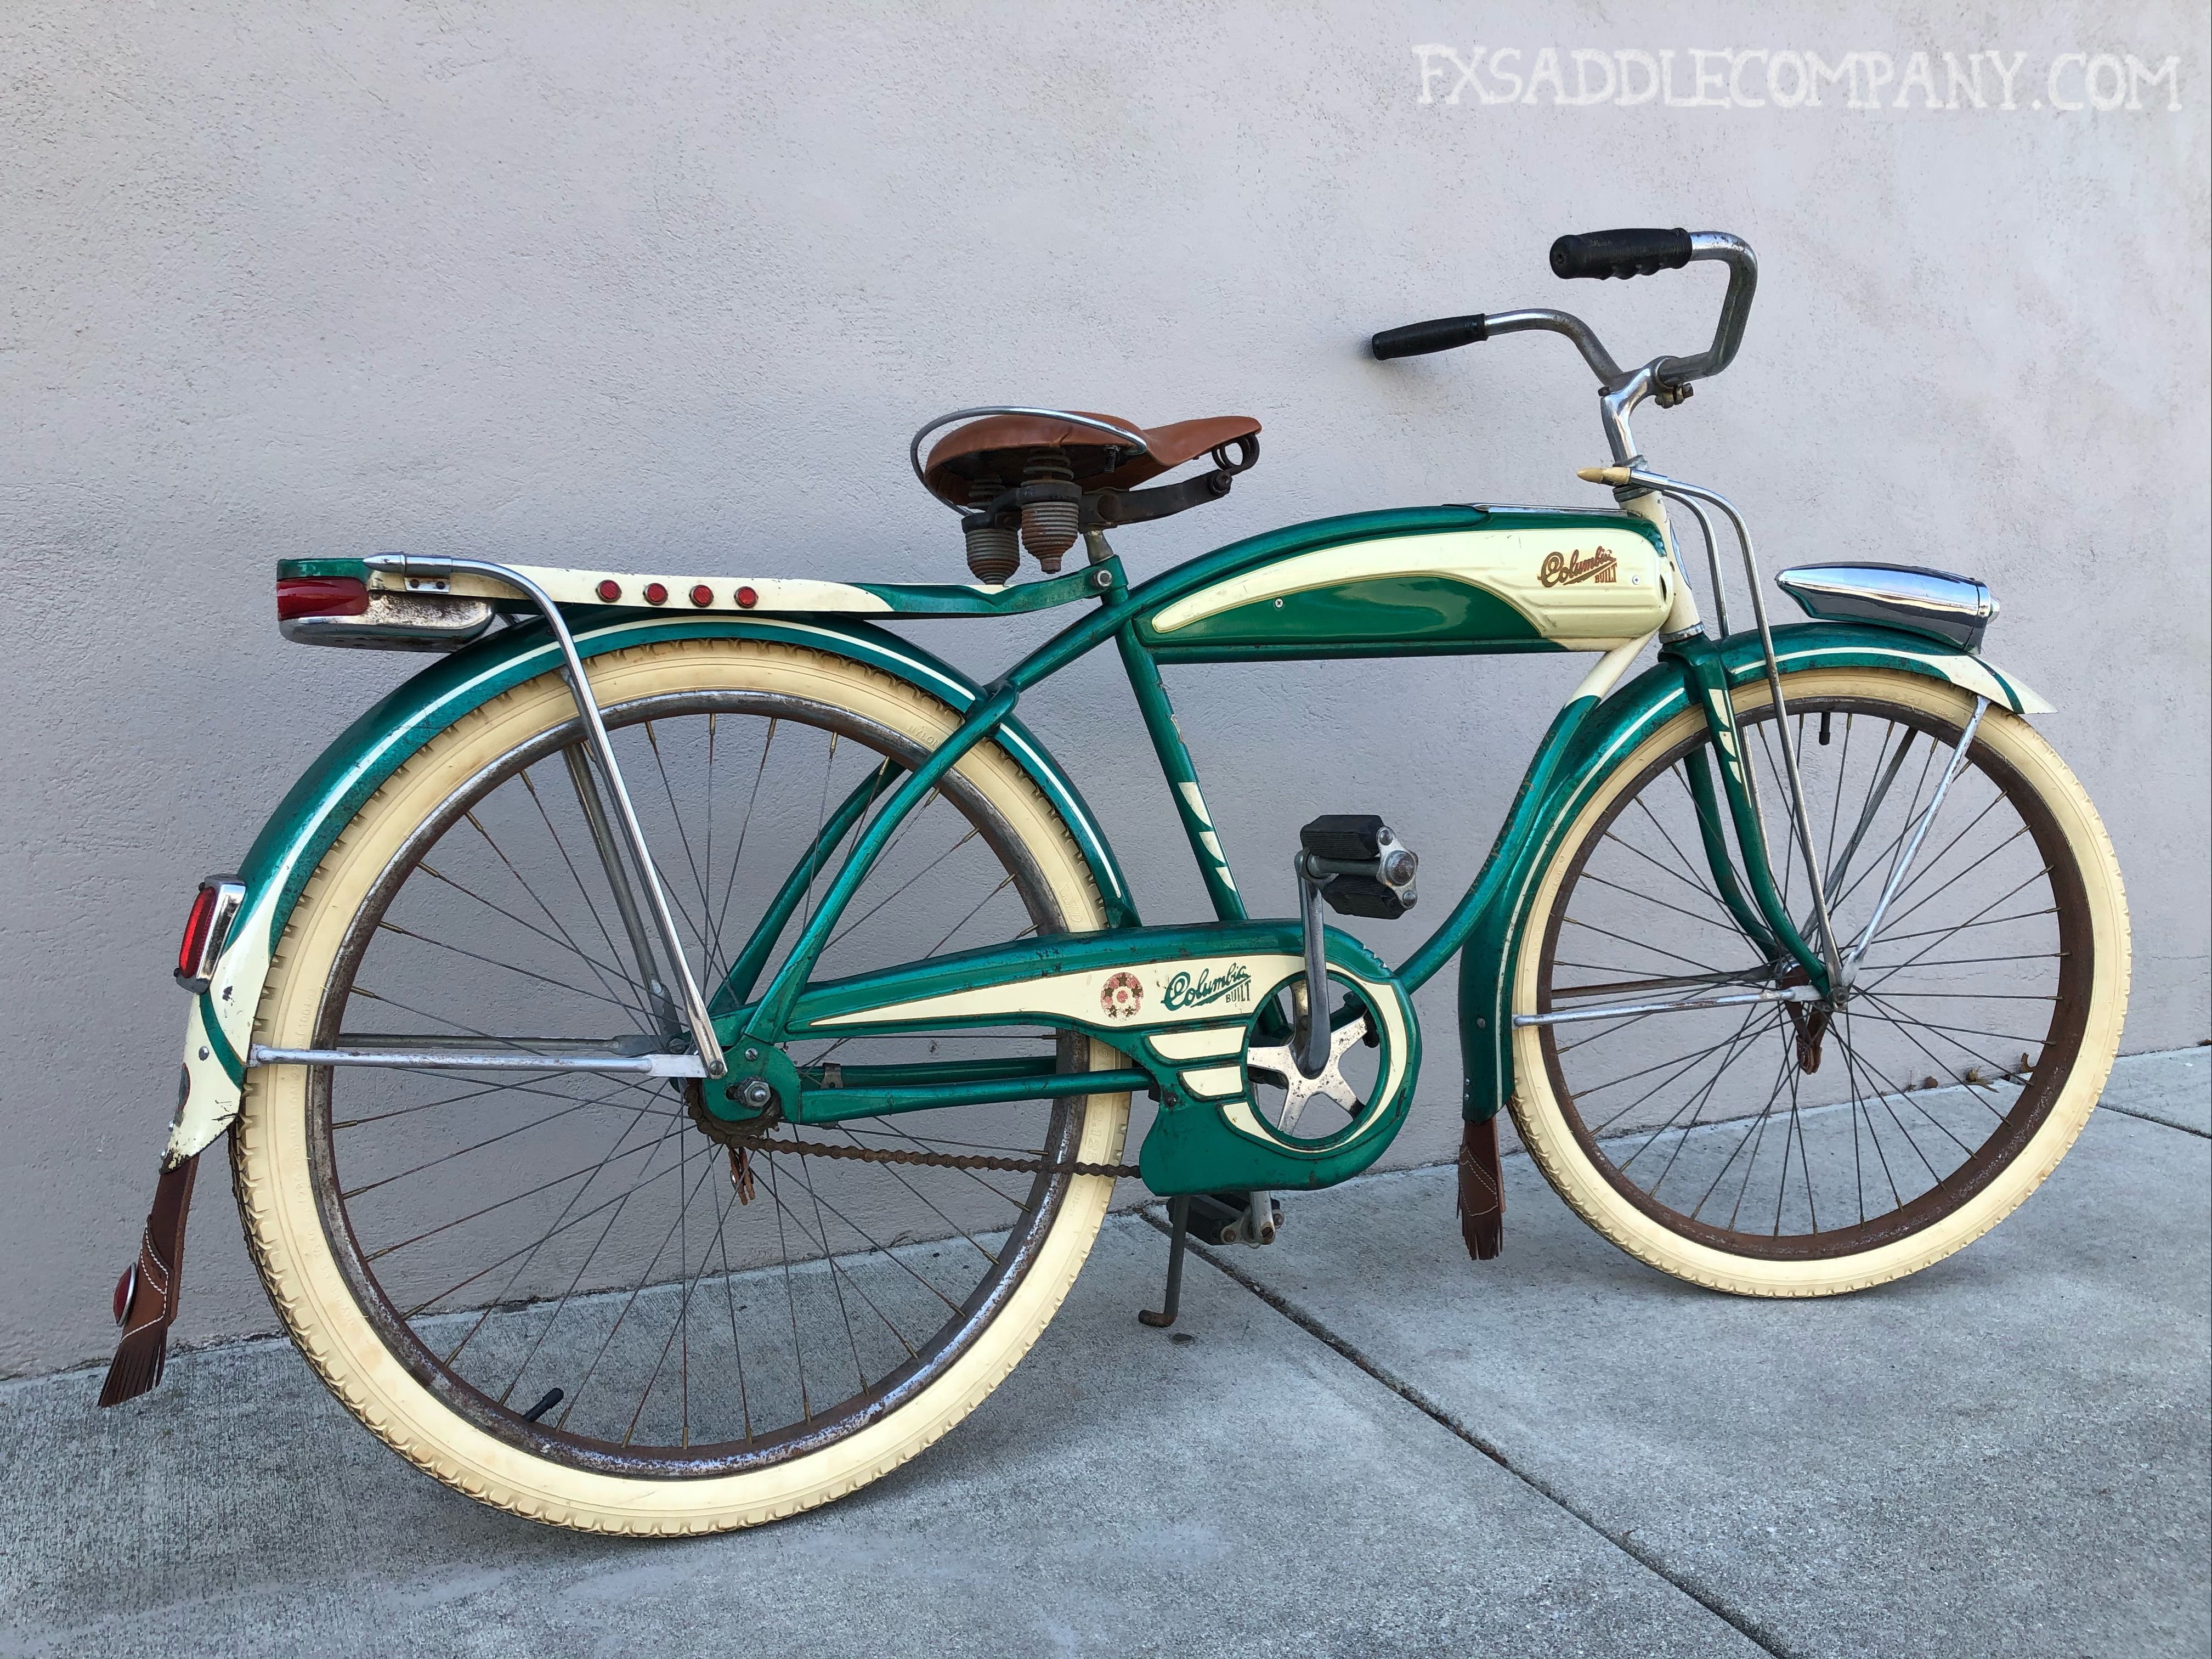 Vintage 1954 Columbia Five Star Bicycle In 2020 Urban Bicycle Design Urban Bicycle Cycling Design